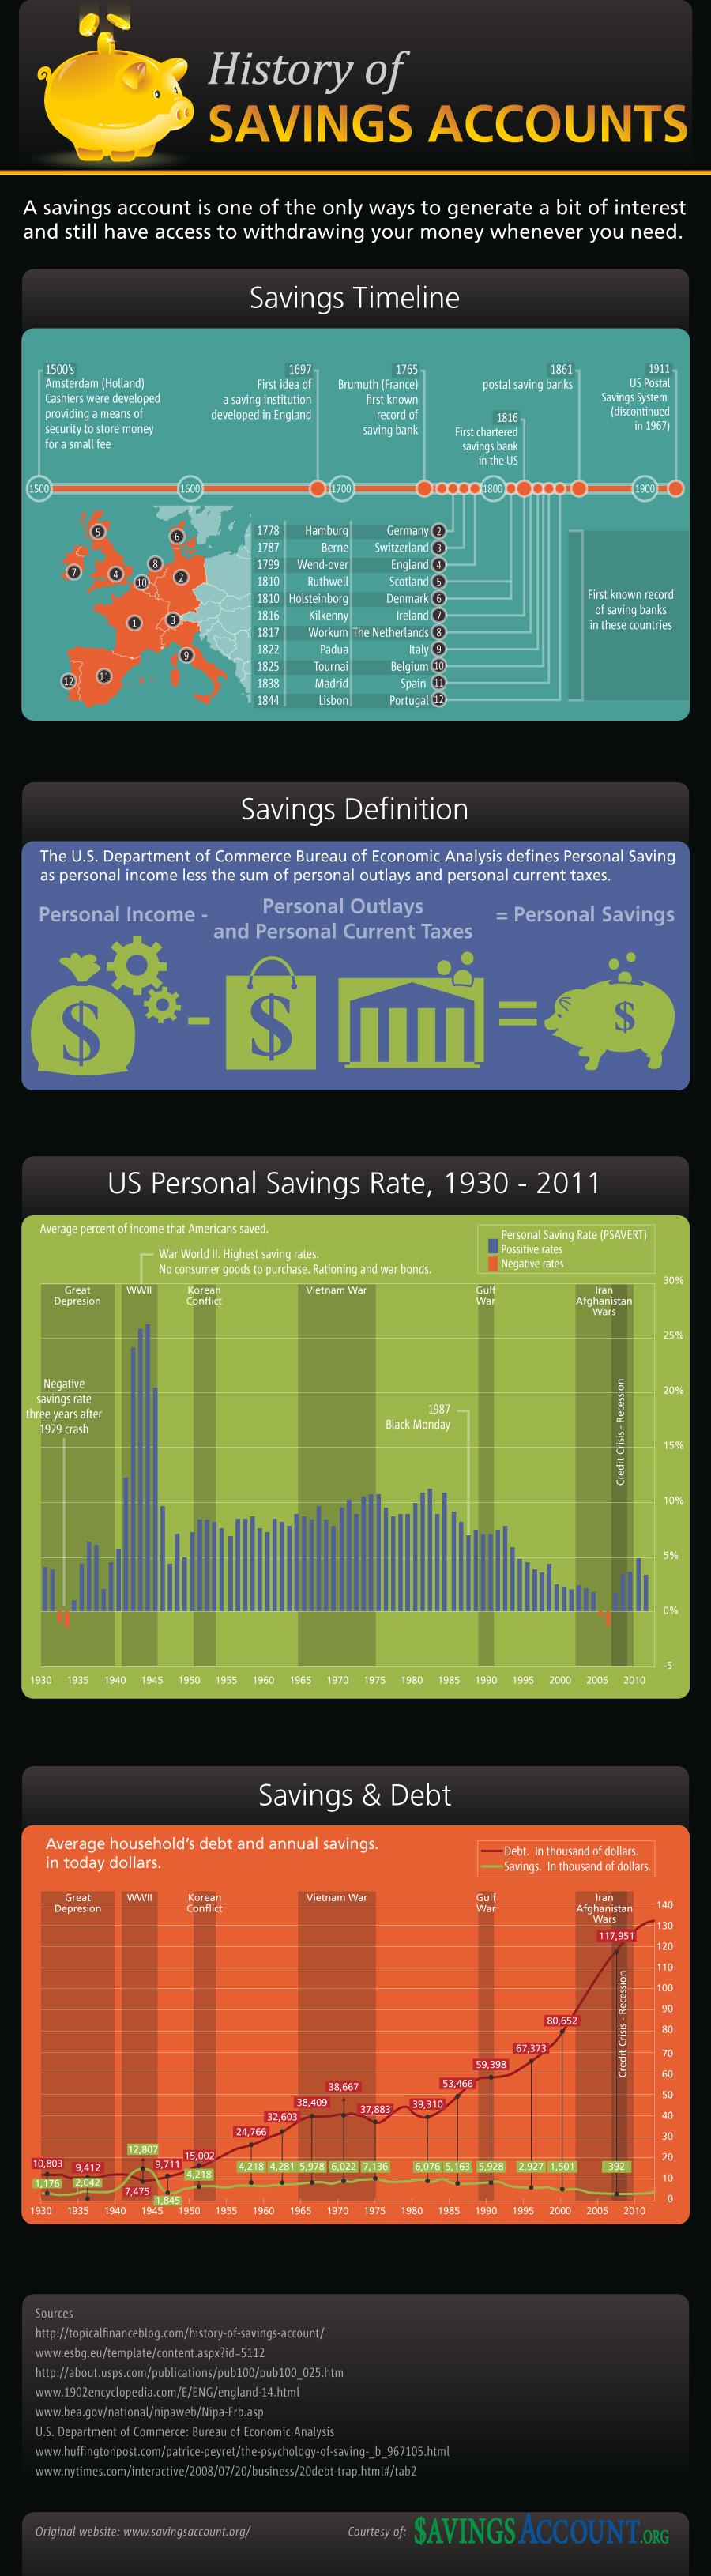 History of Savings Accounts